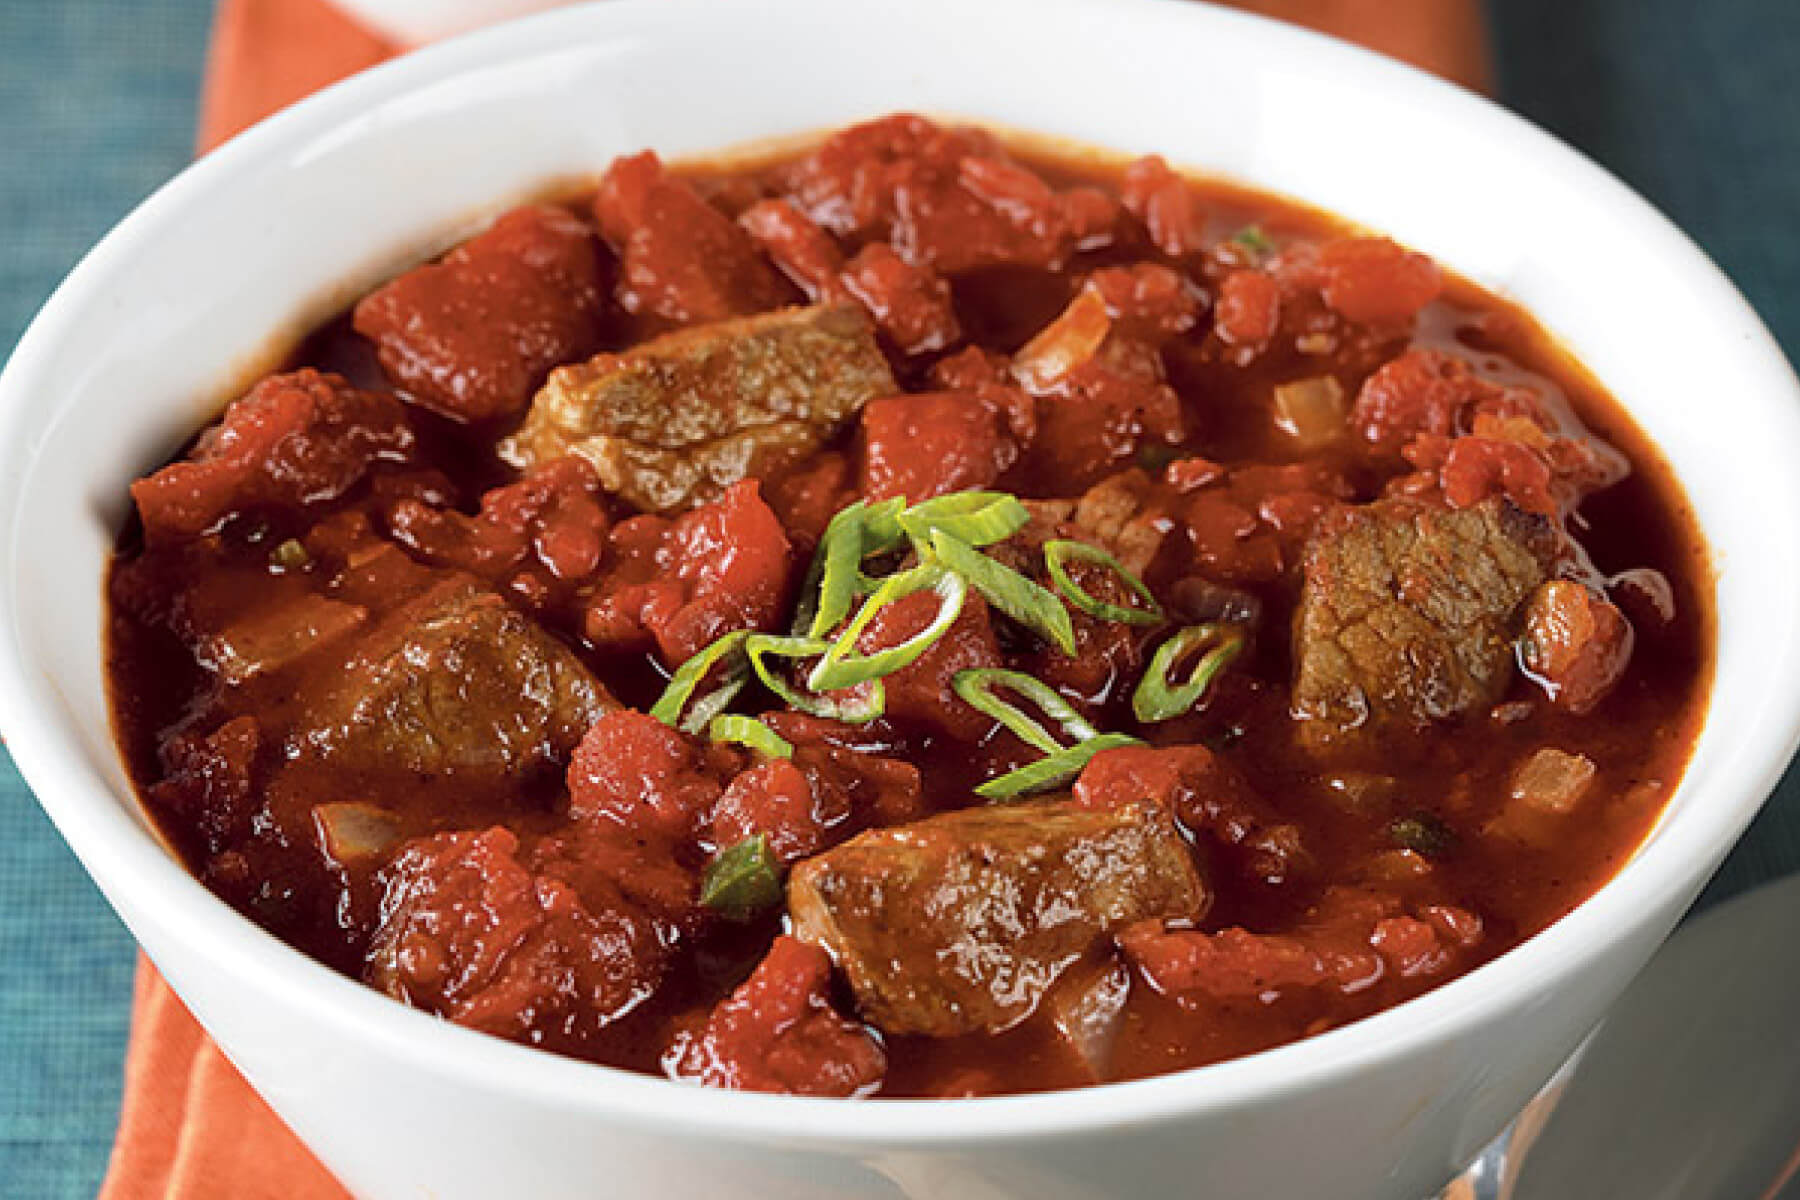 Chunky Beef Chili